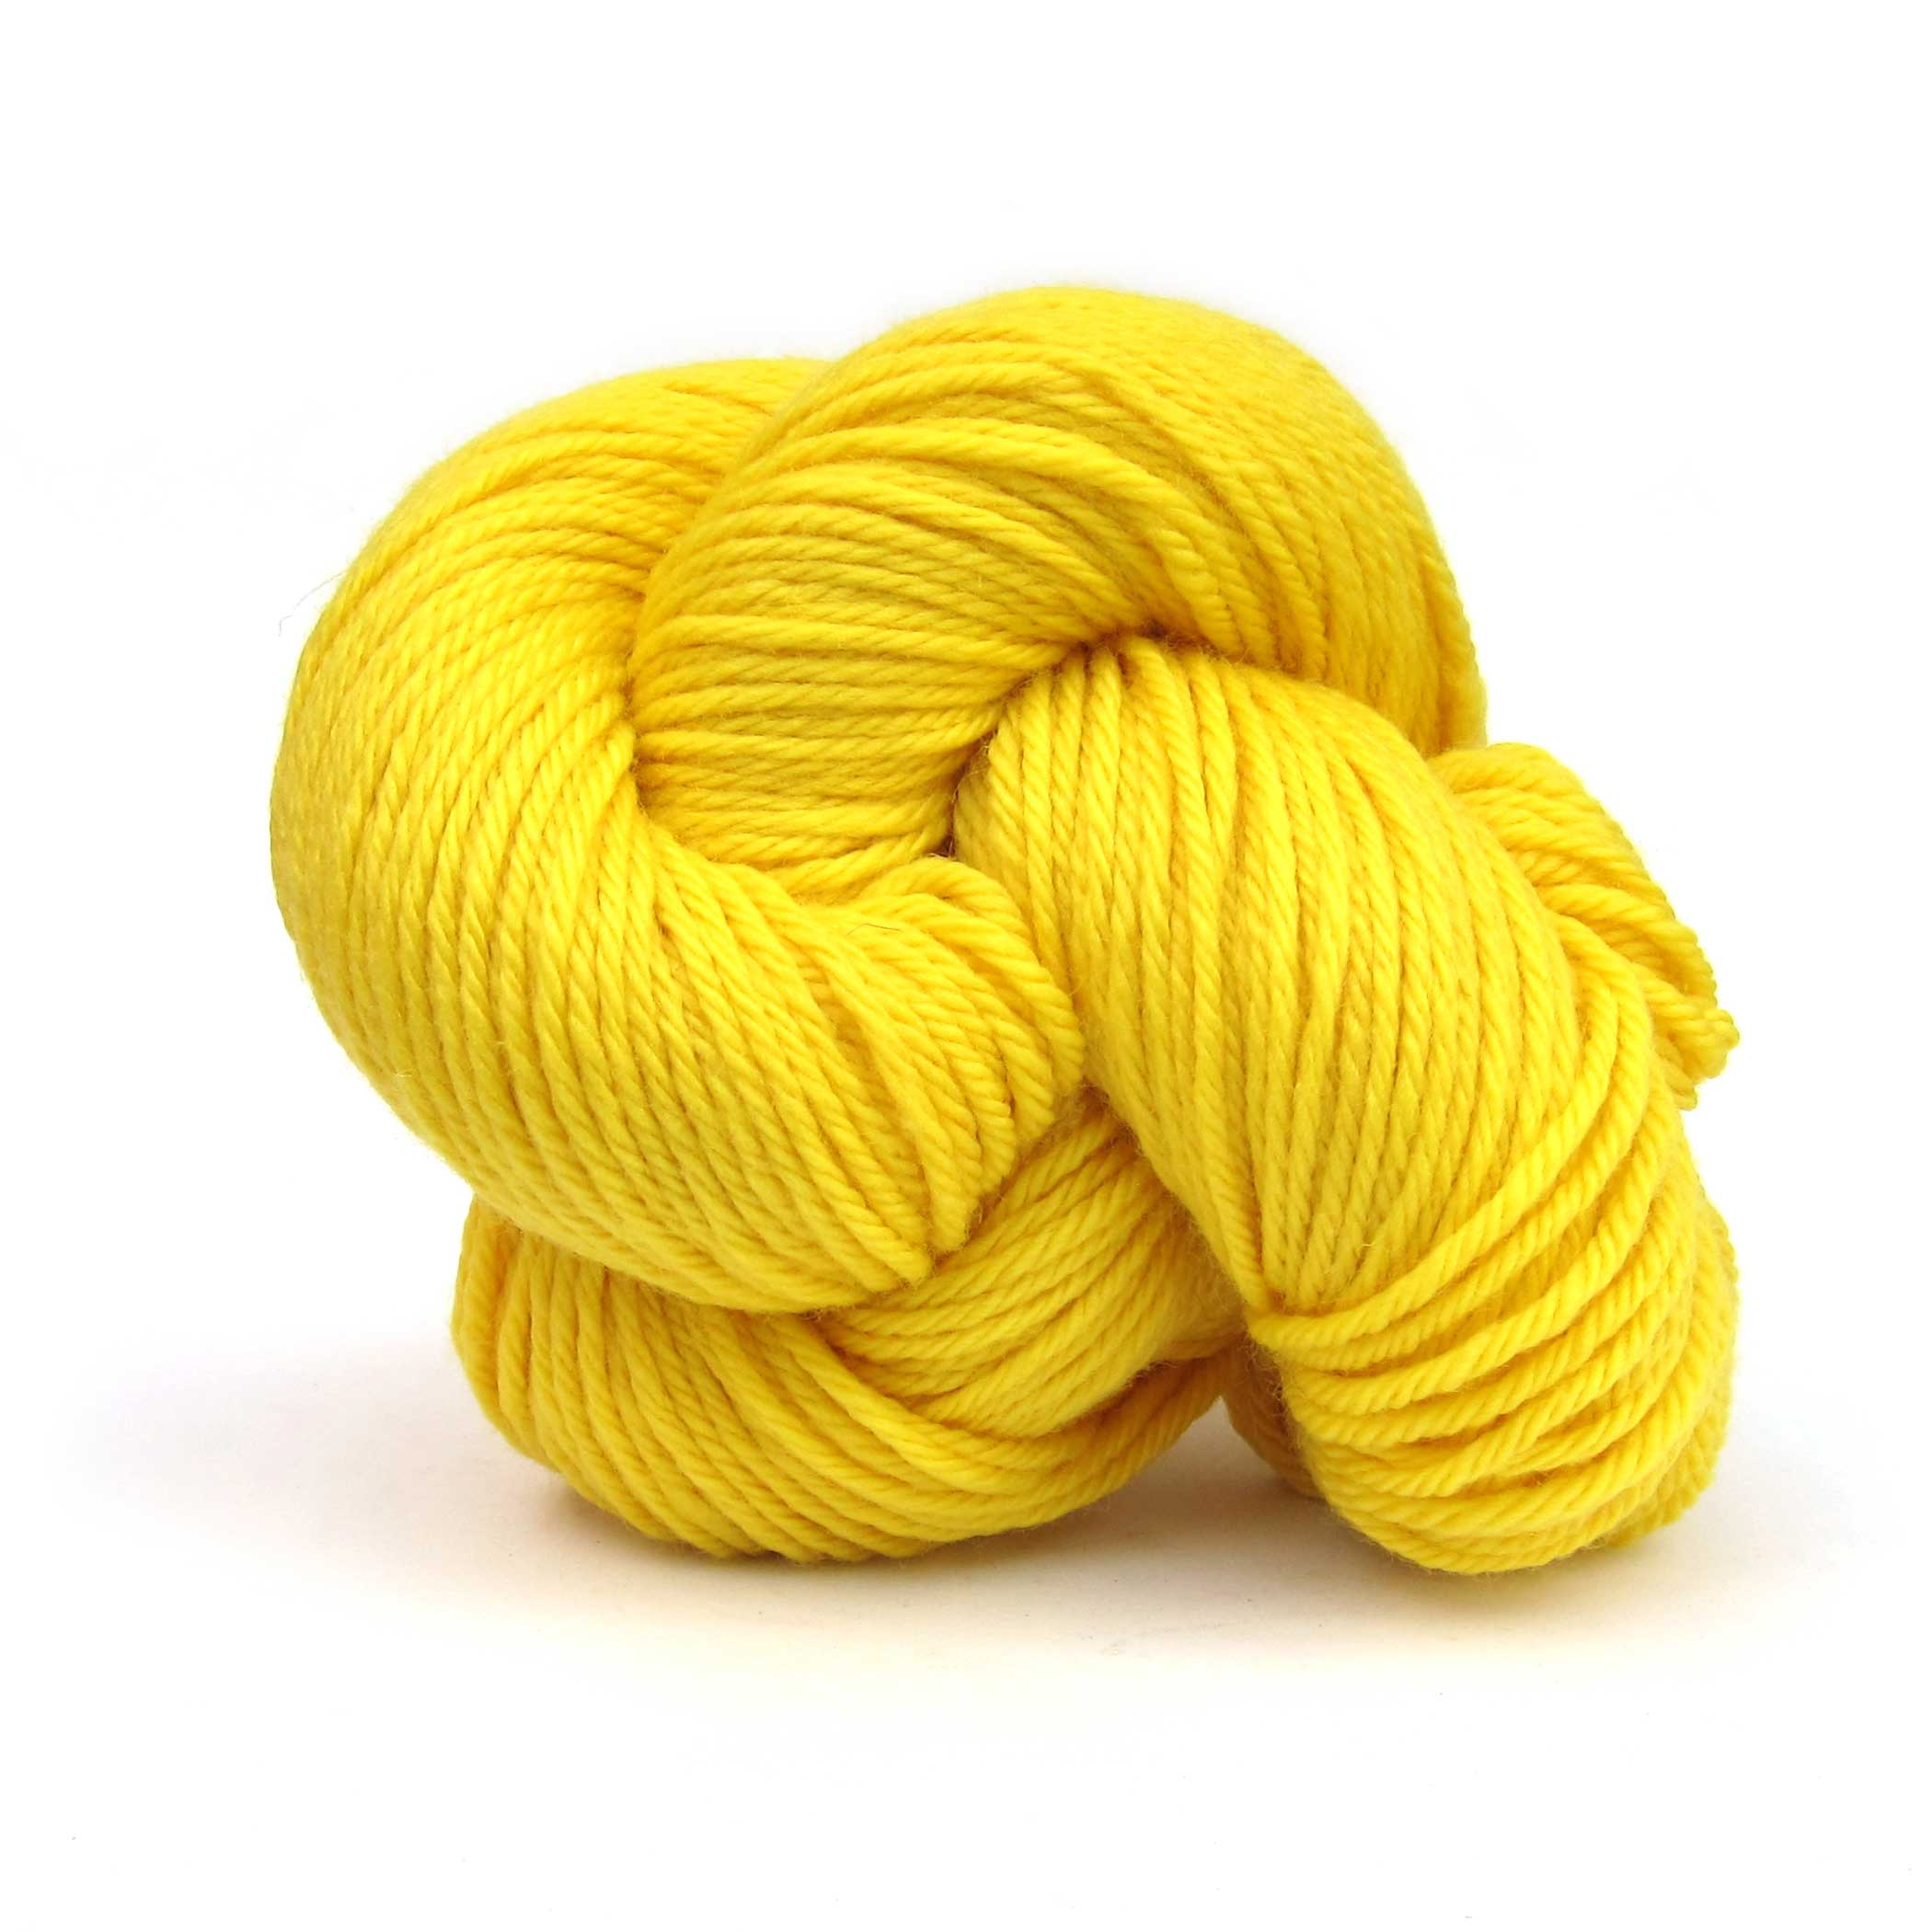 Lemon Louet Gems 100% Merino Superwash Yarn